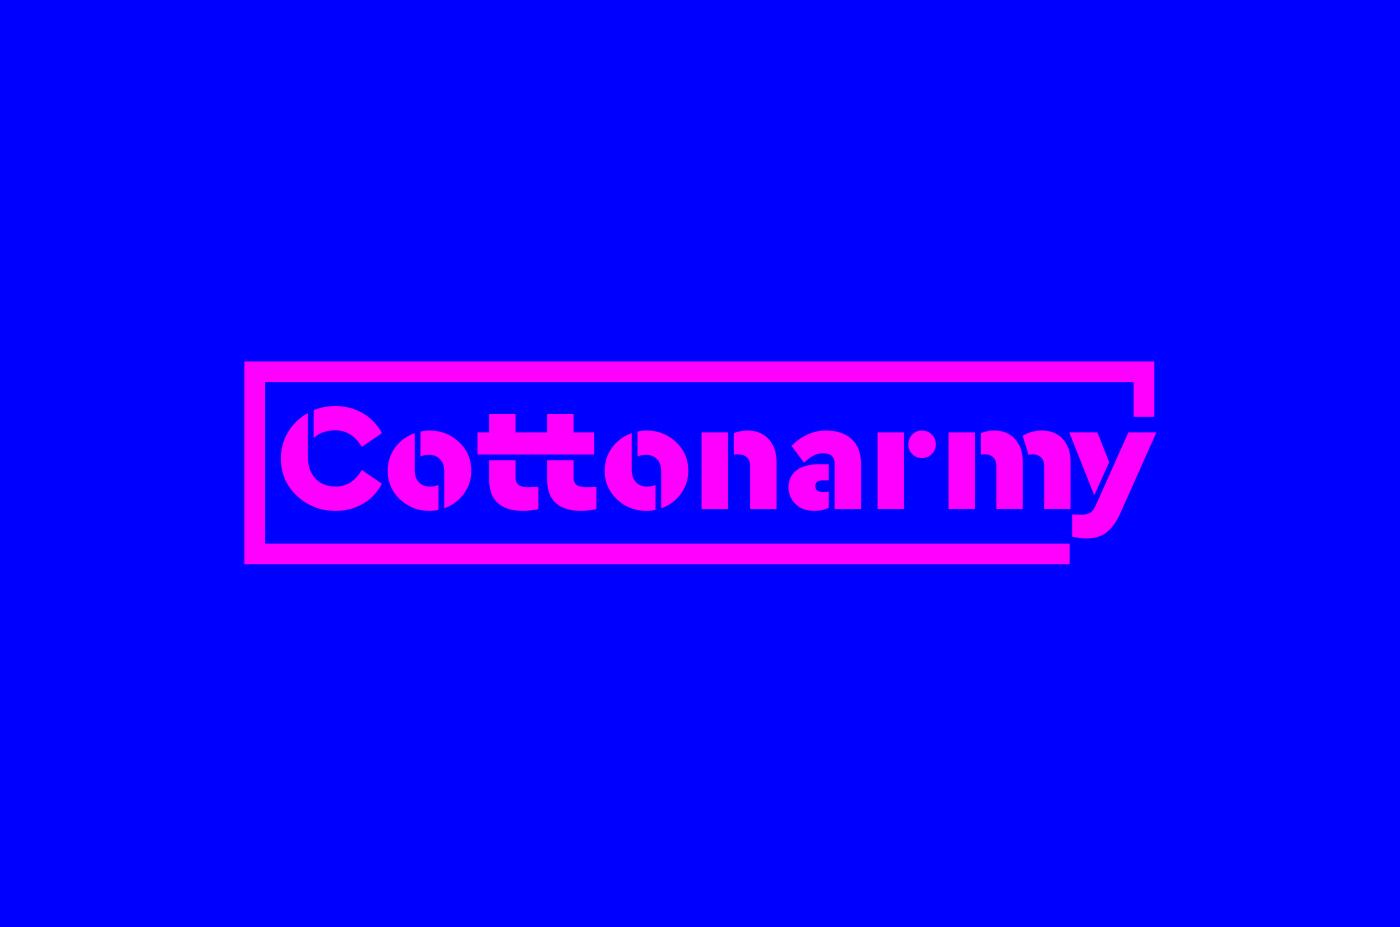 cottonarmy_1